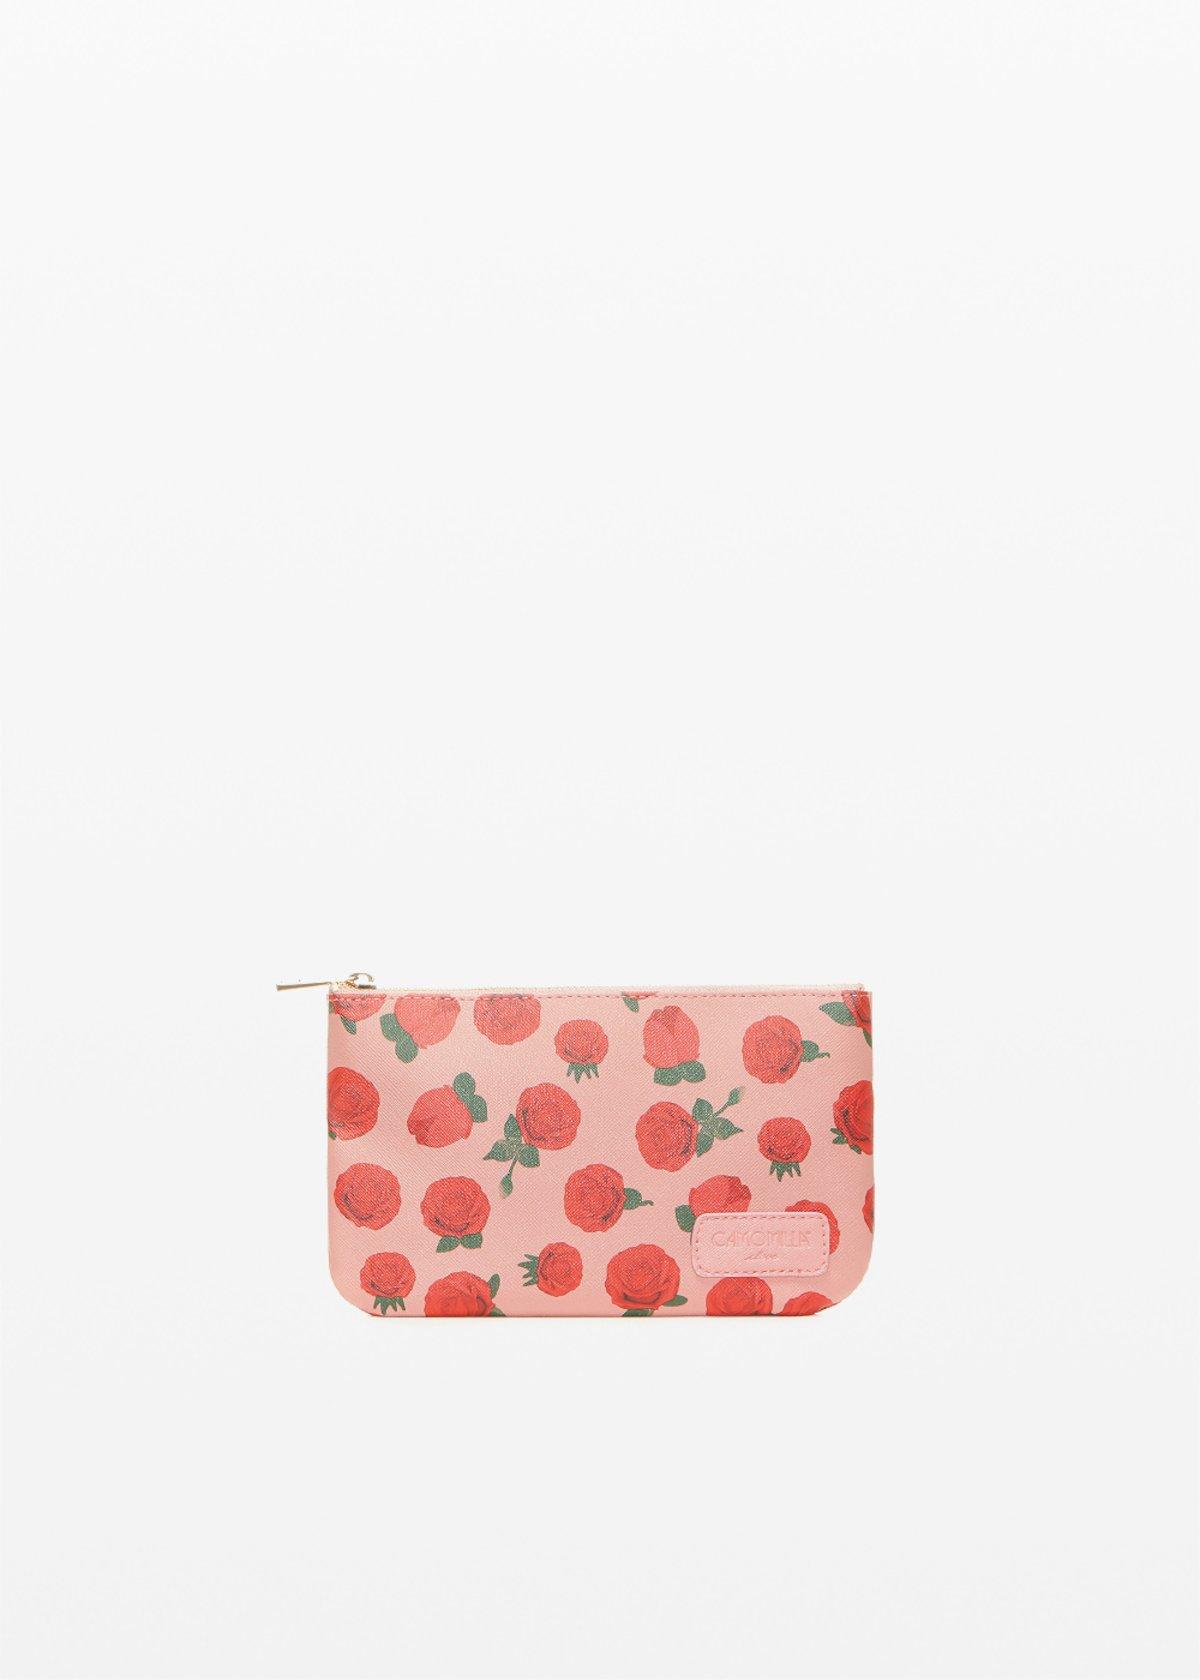 Pochette Tonga Ros6 in ecopelle stampa rose - Calcite Fantasia - Donna